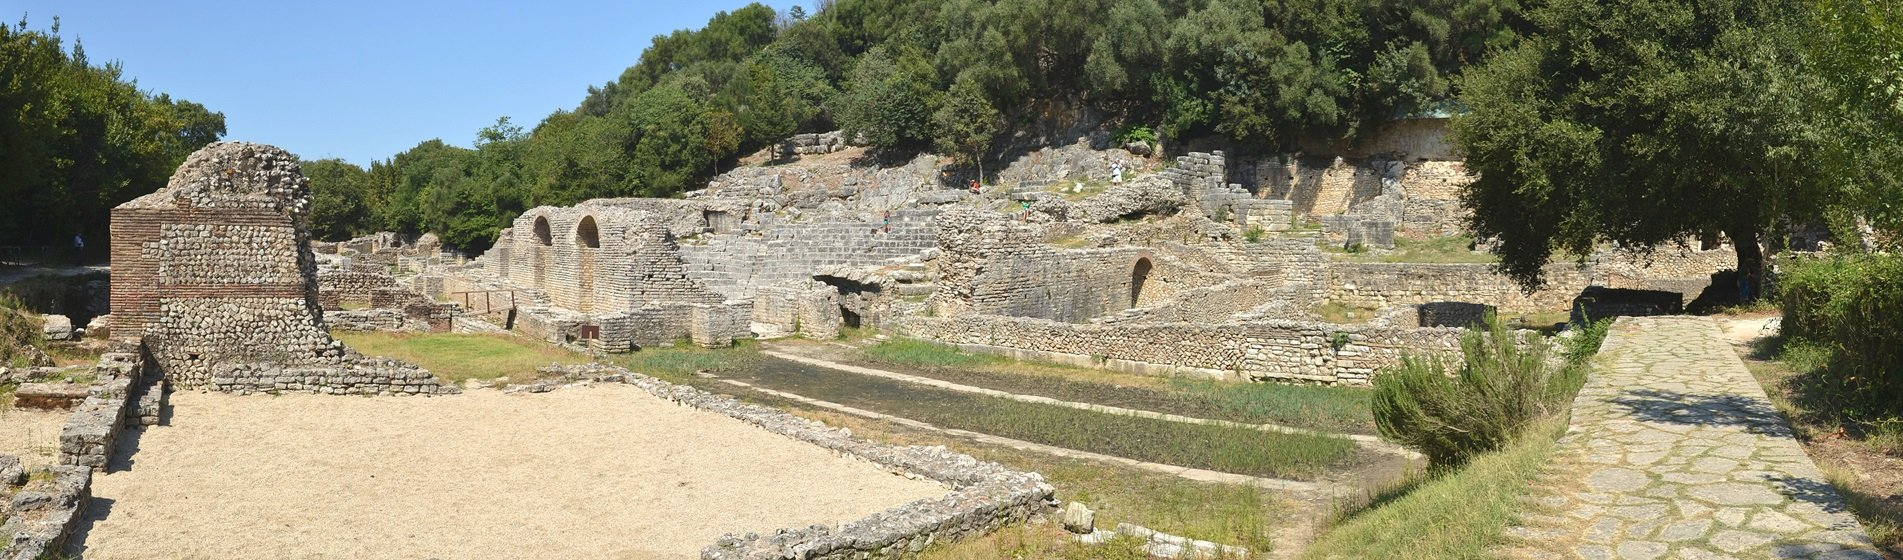 Agora at the ancient city of Butrint